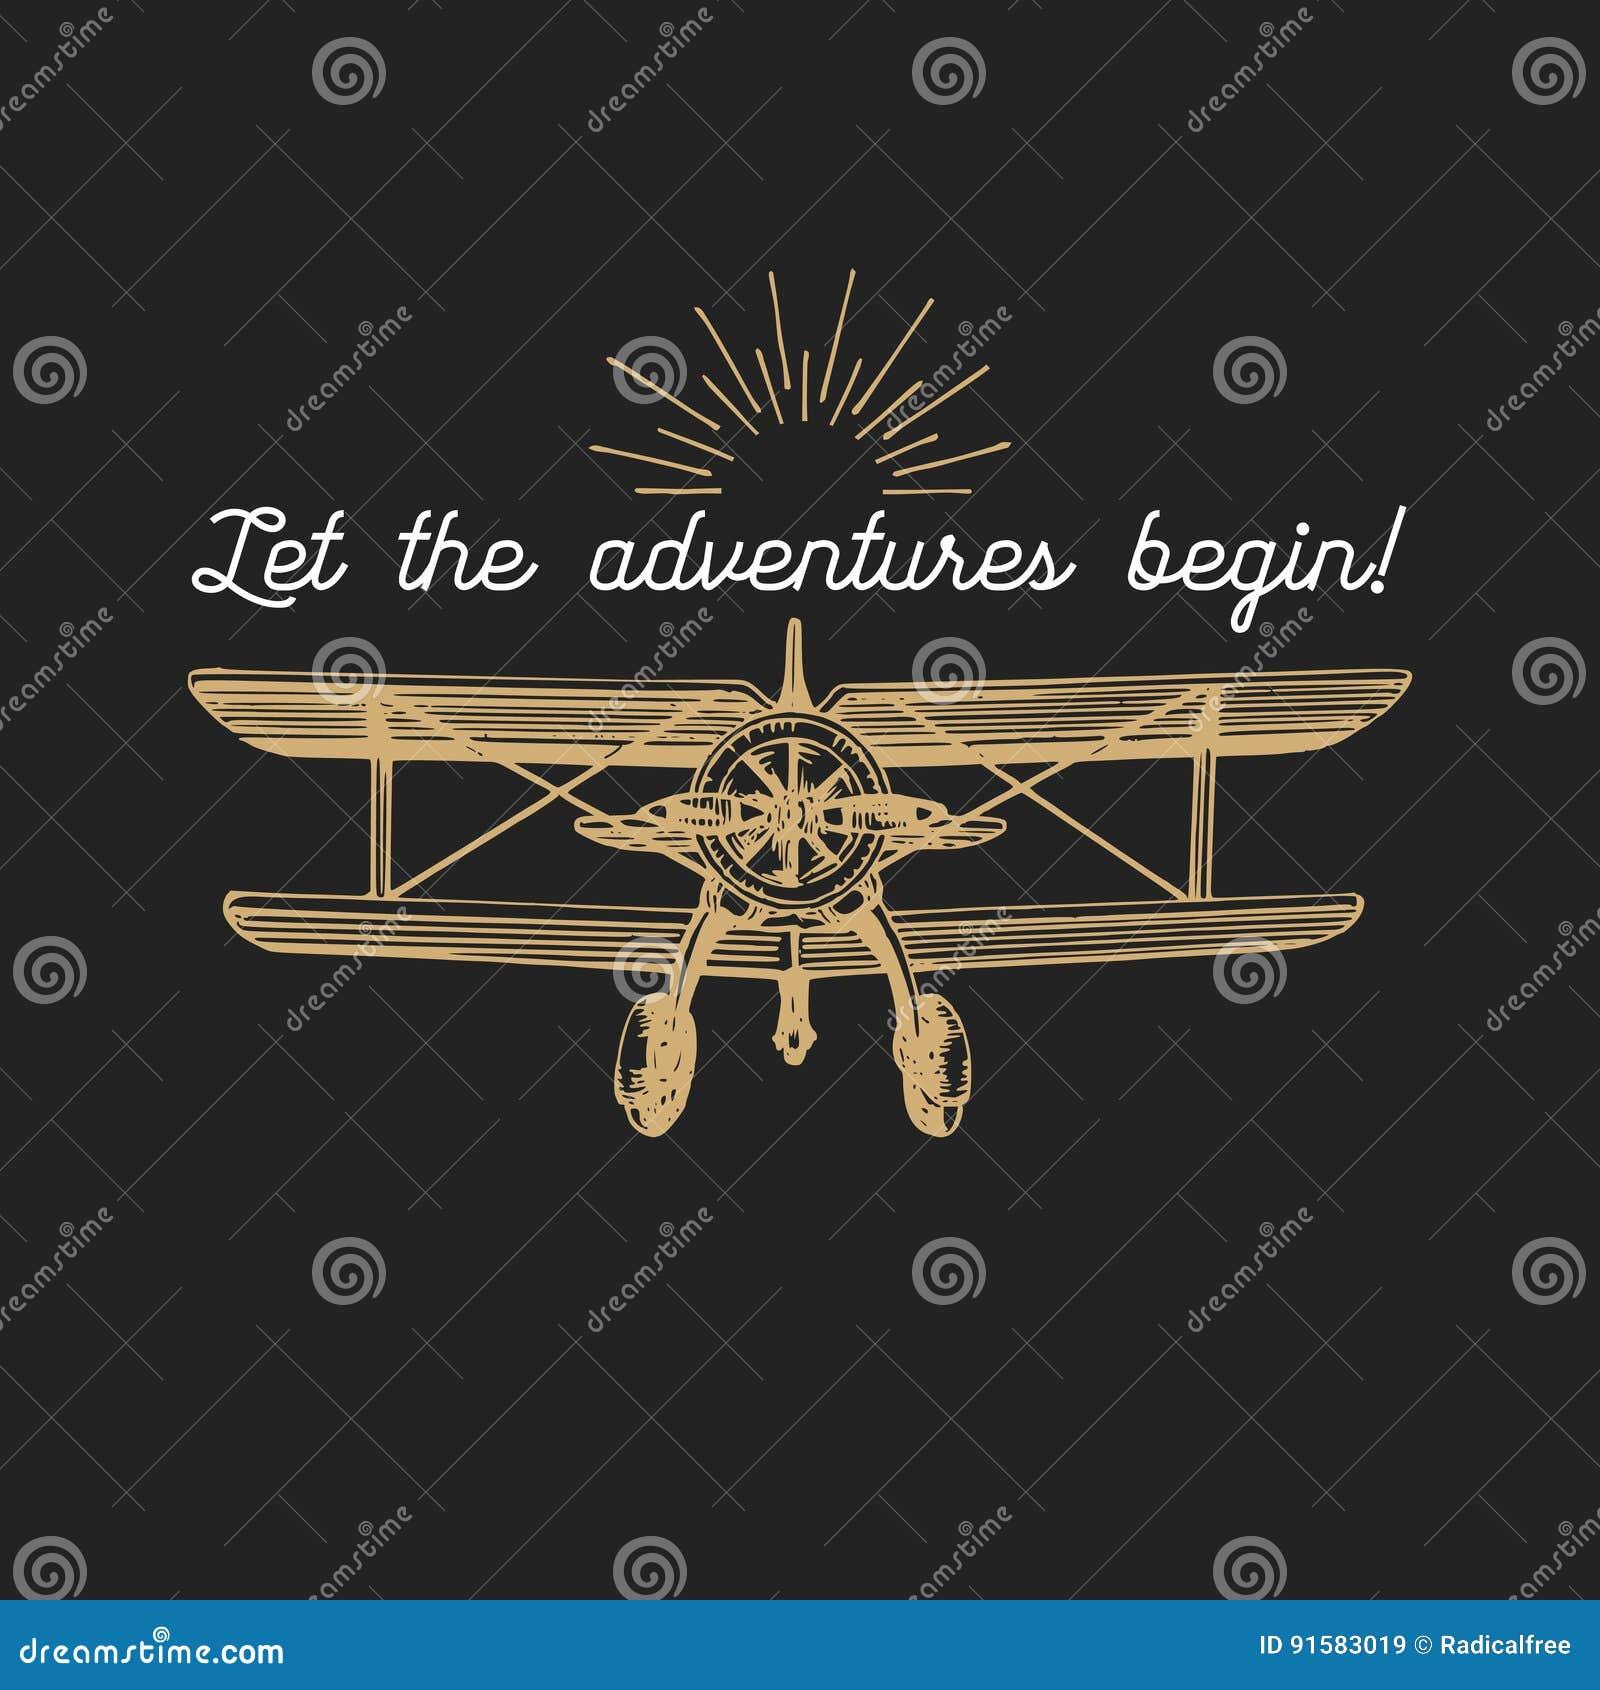 Let the adventures begin motivational quote. Vintage retro airplane logo. Hand sketched aviation illustration.